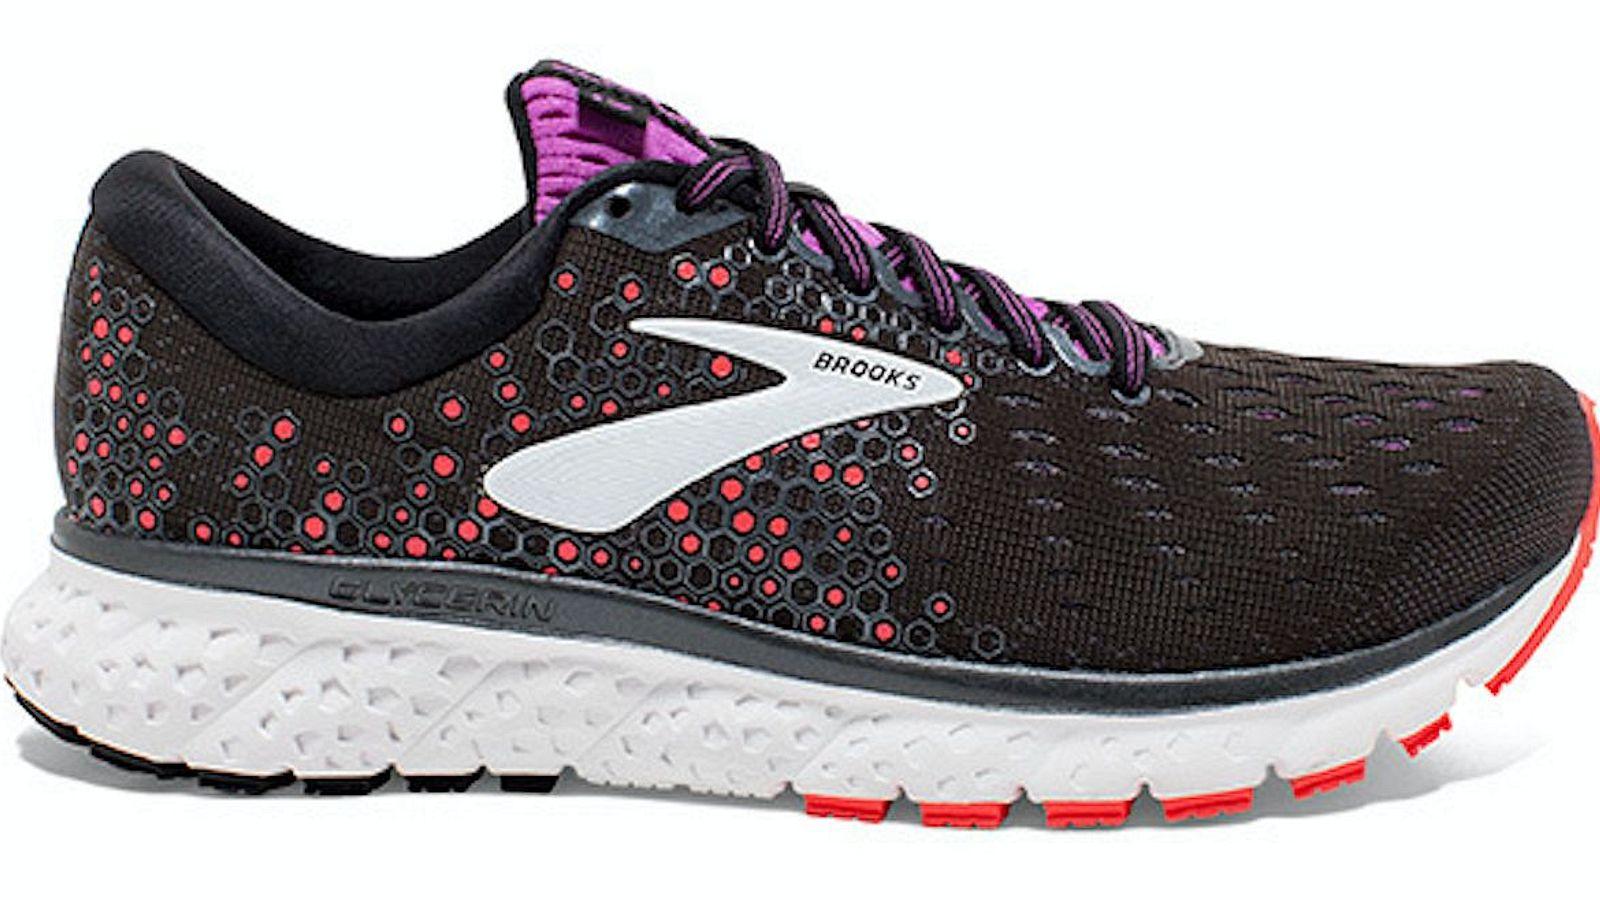 brooks cross training shoes